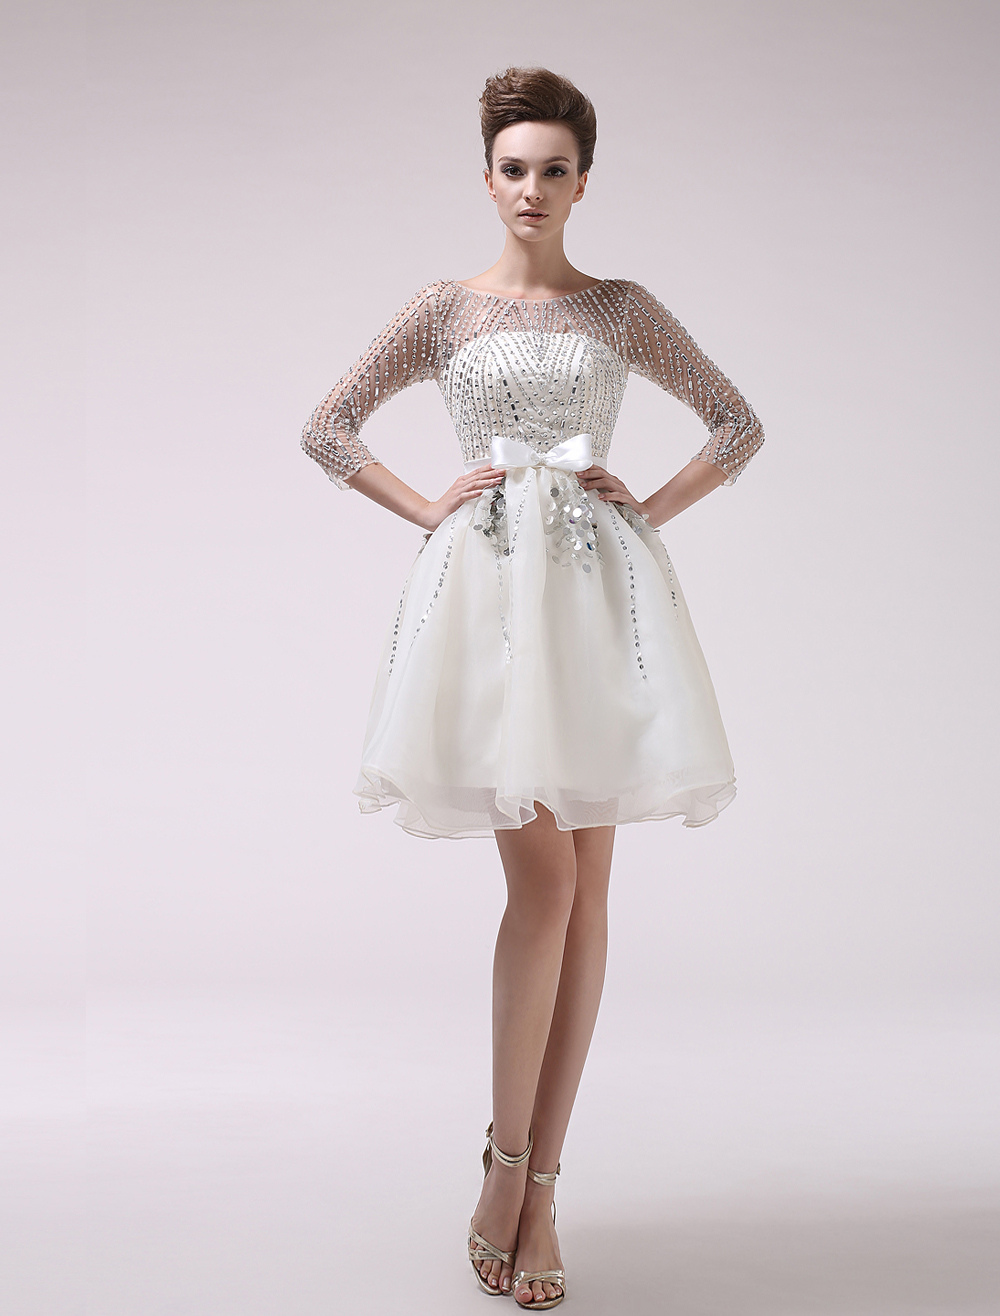 Ivory Prom Dress Sequins Sash Bow Semi-Sheer Organza Dress Milanoo